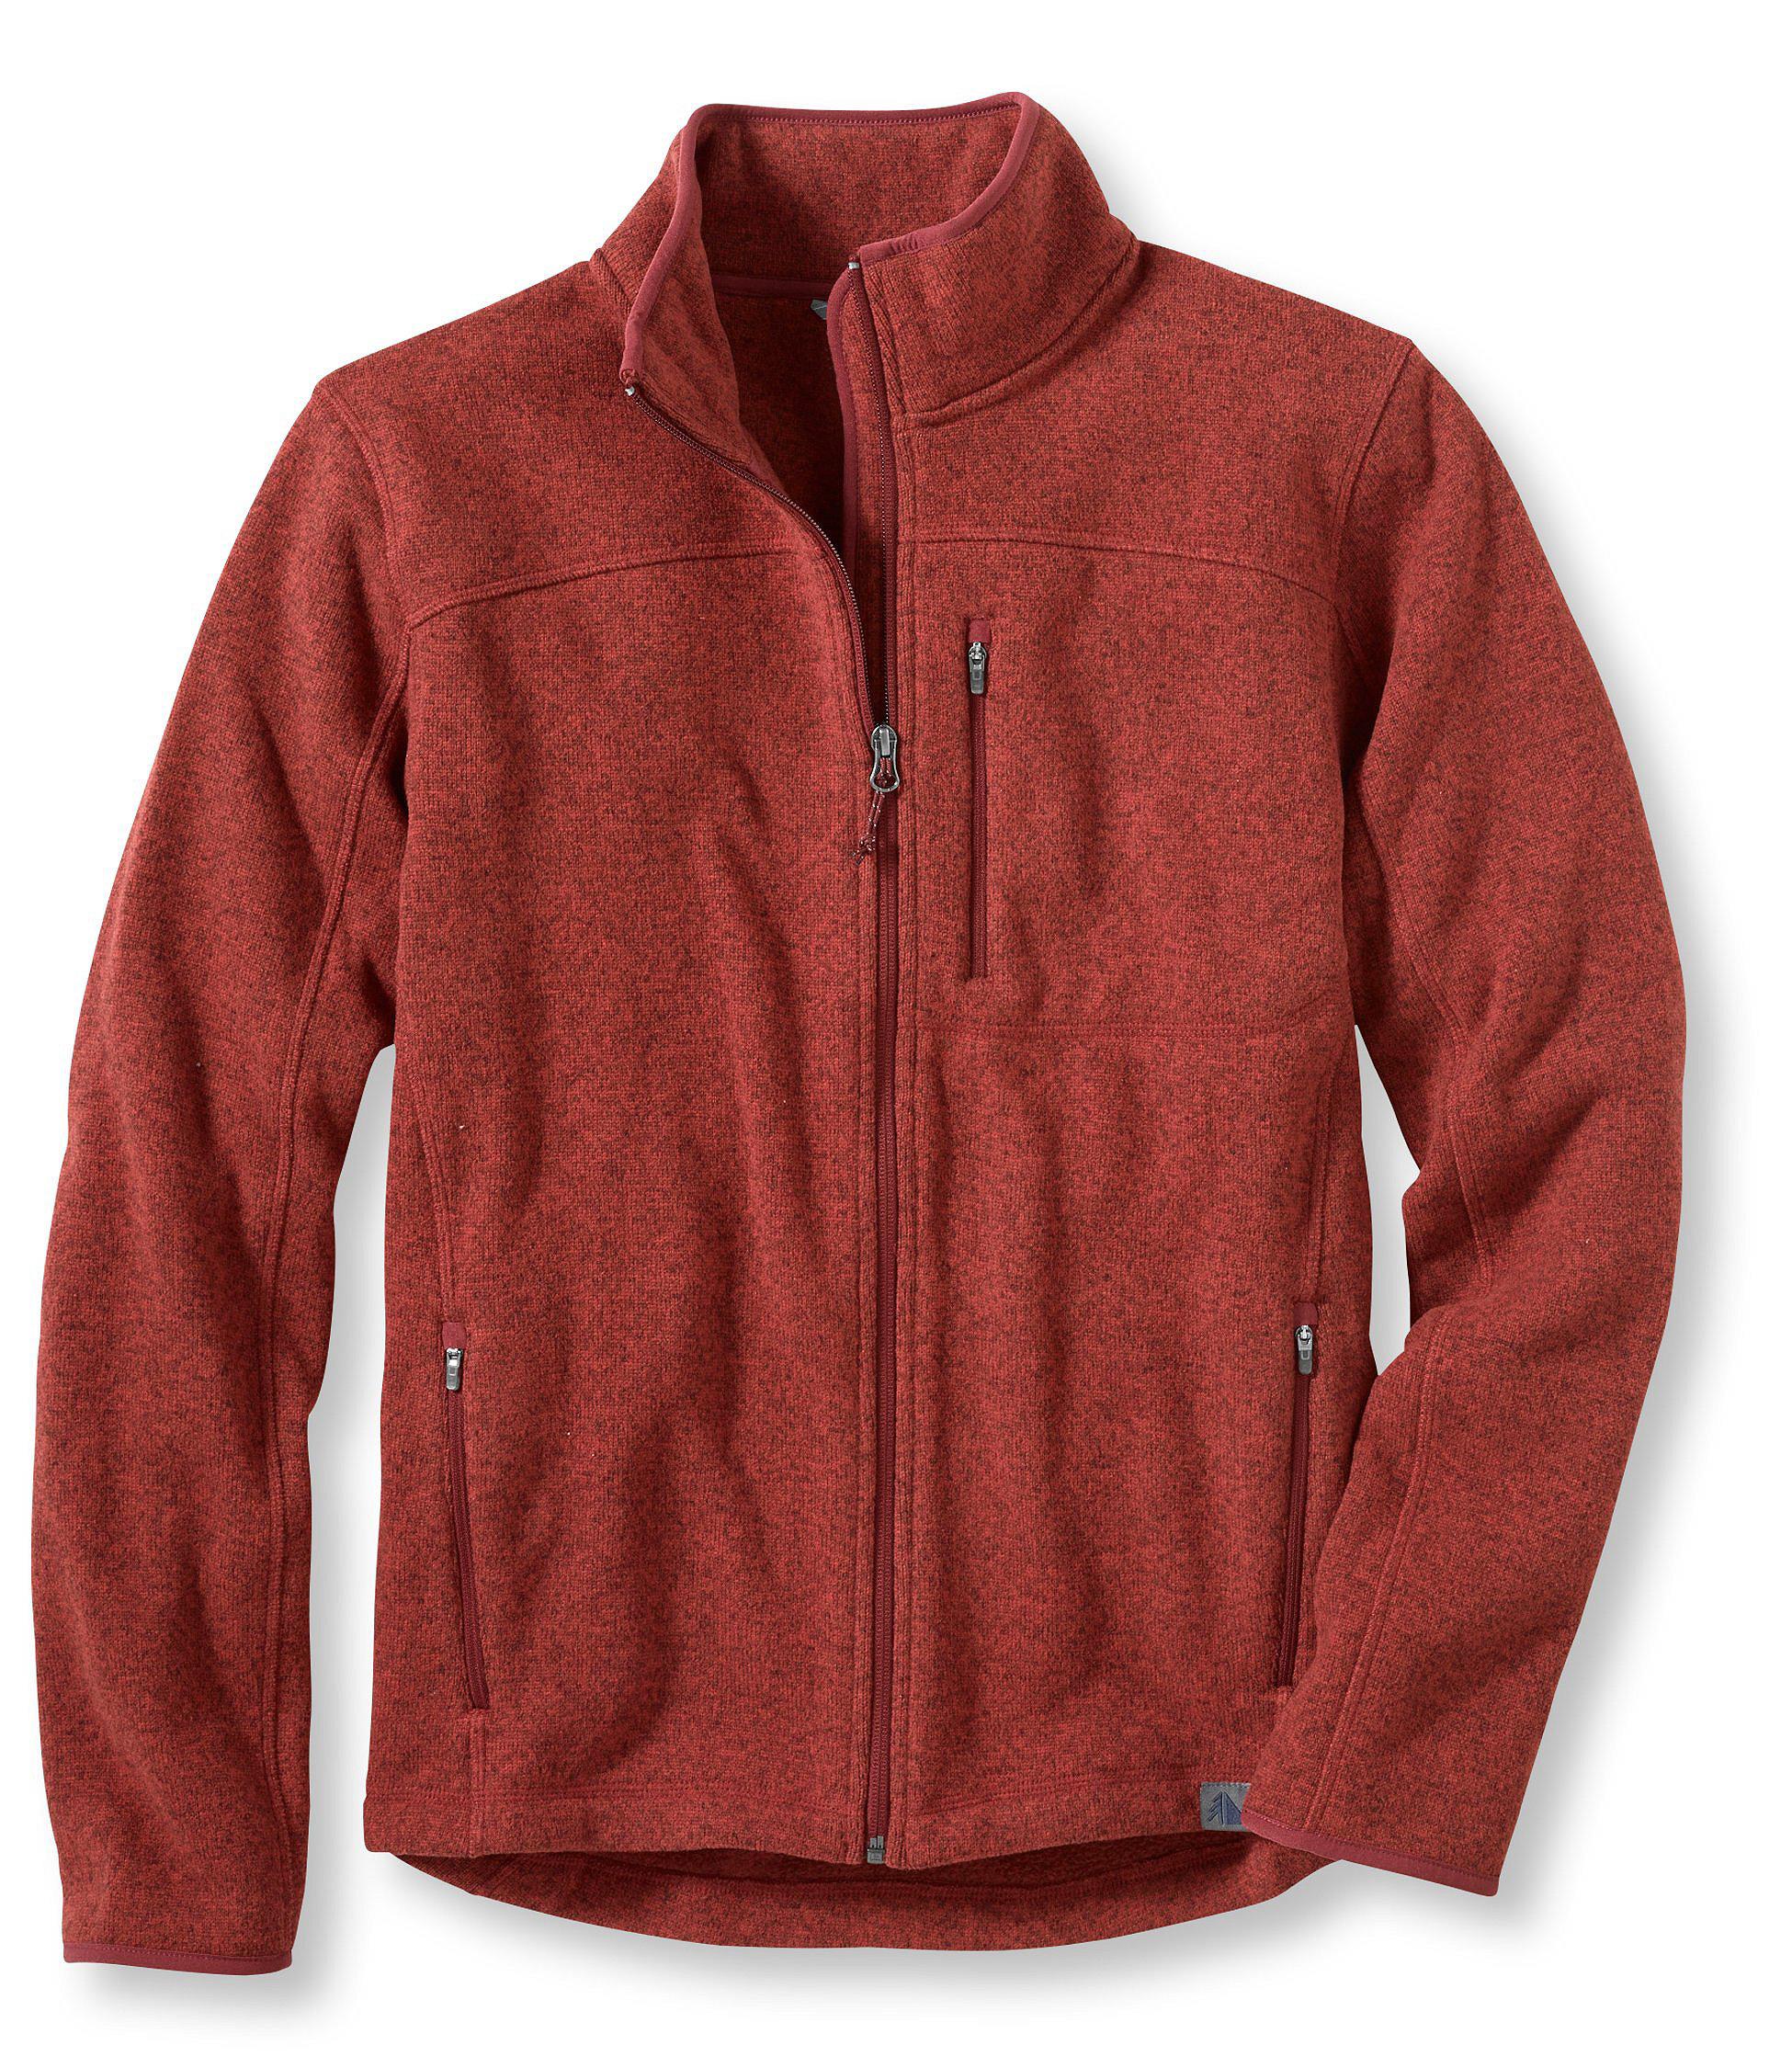 Men's L.L.Bean Sweater Fleece Full-Zip Jacket | Free Shipping at ...